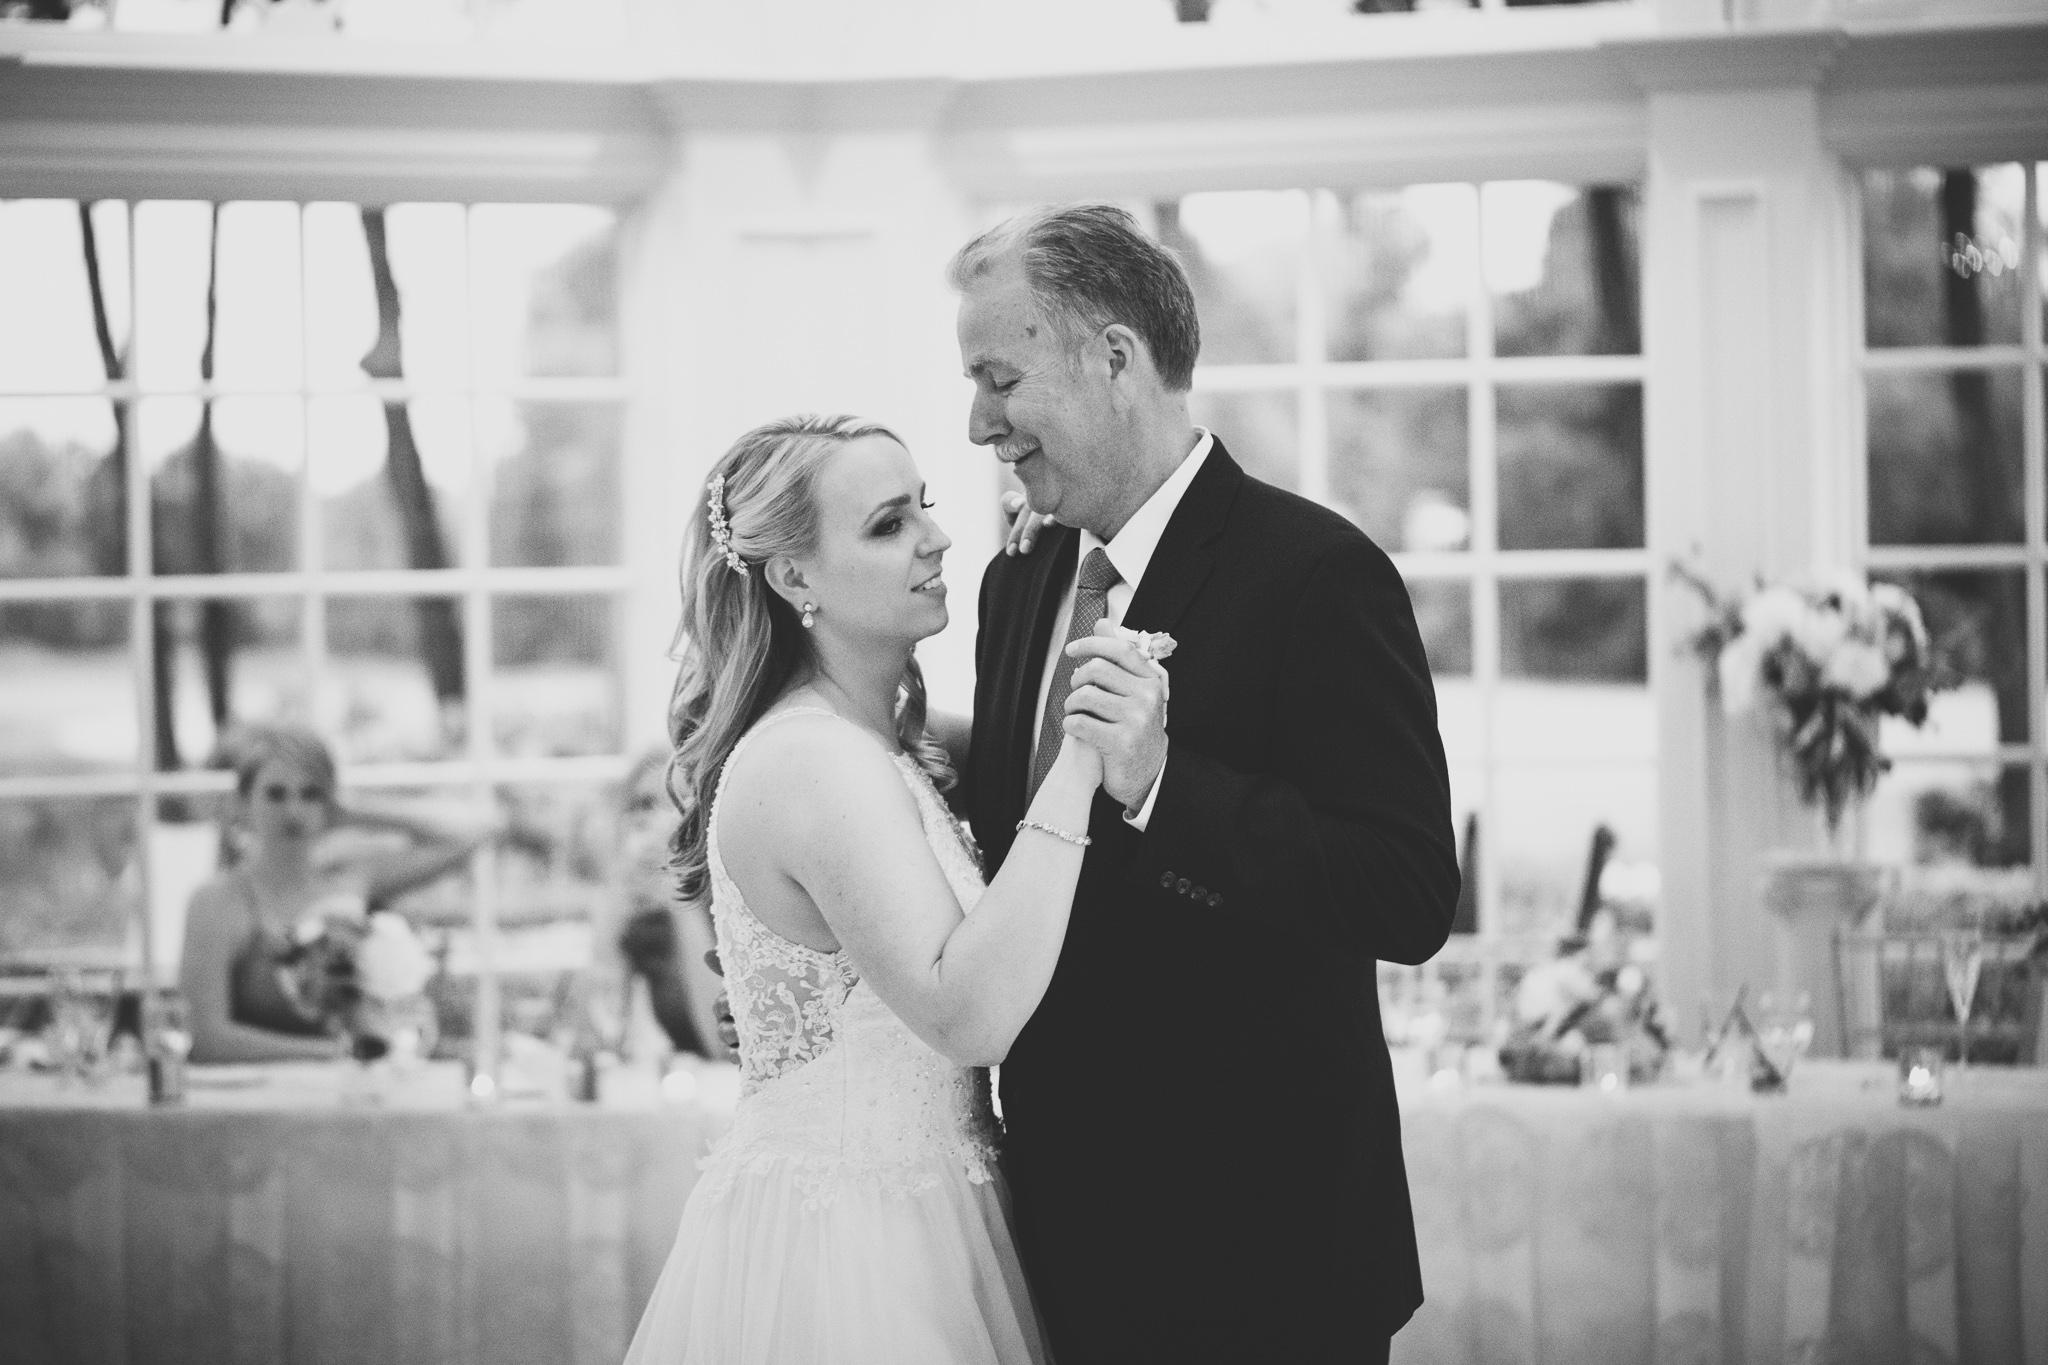 171-best-detroit-michigan-outdoor-wedding-photographer.jpg